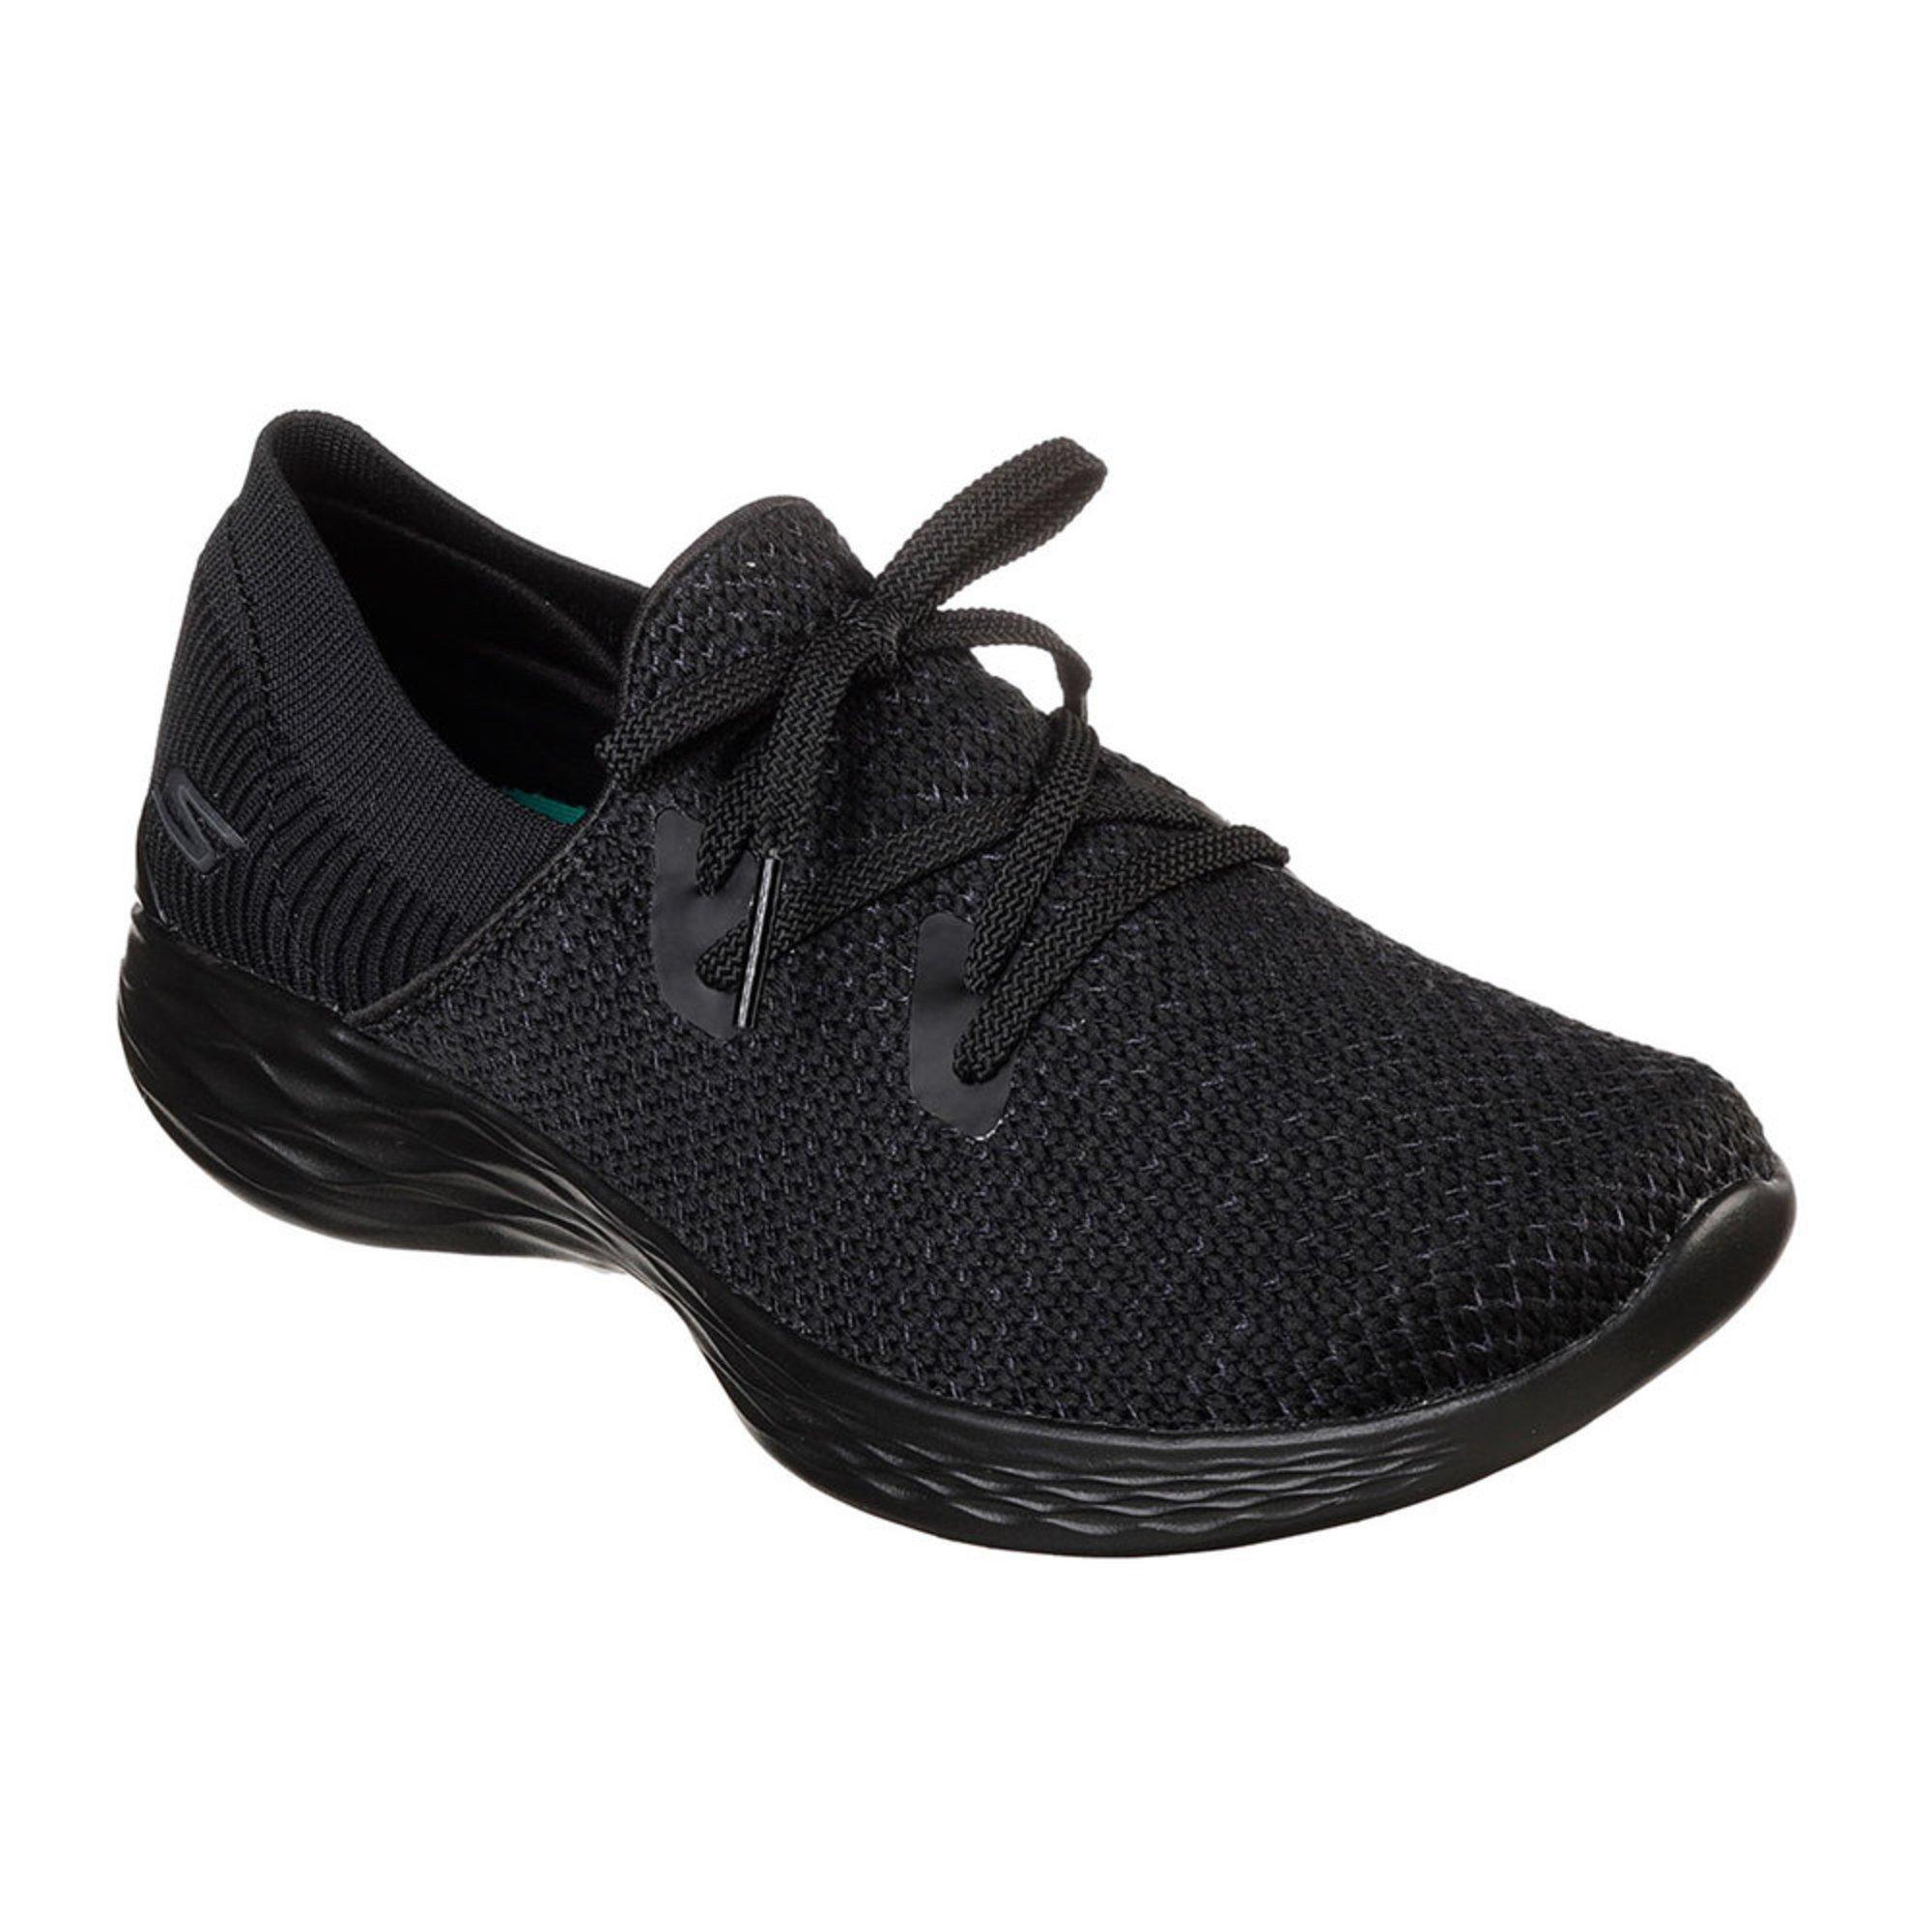 Skechers Women s Sport You Prominence Lace Up Sneaker  2e3d3dc900